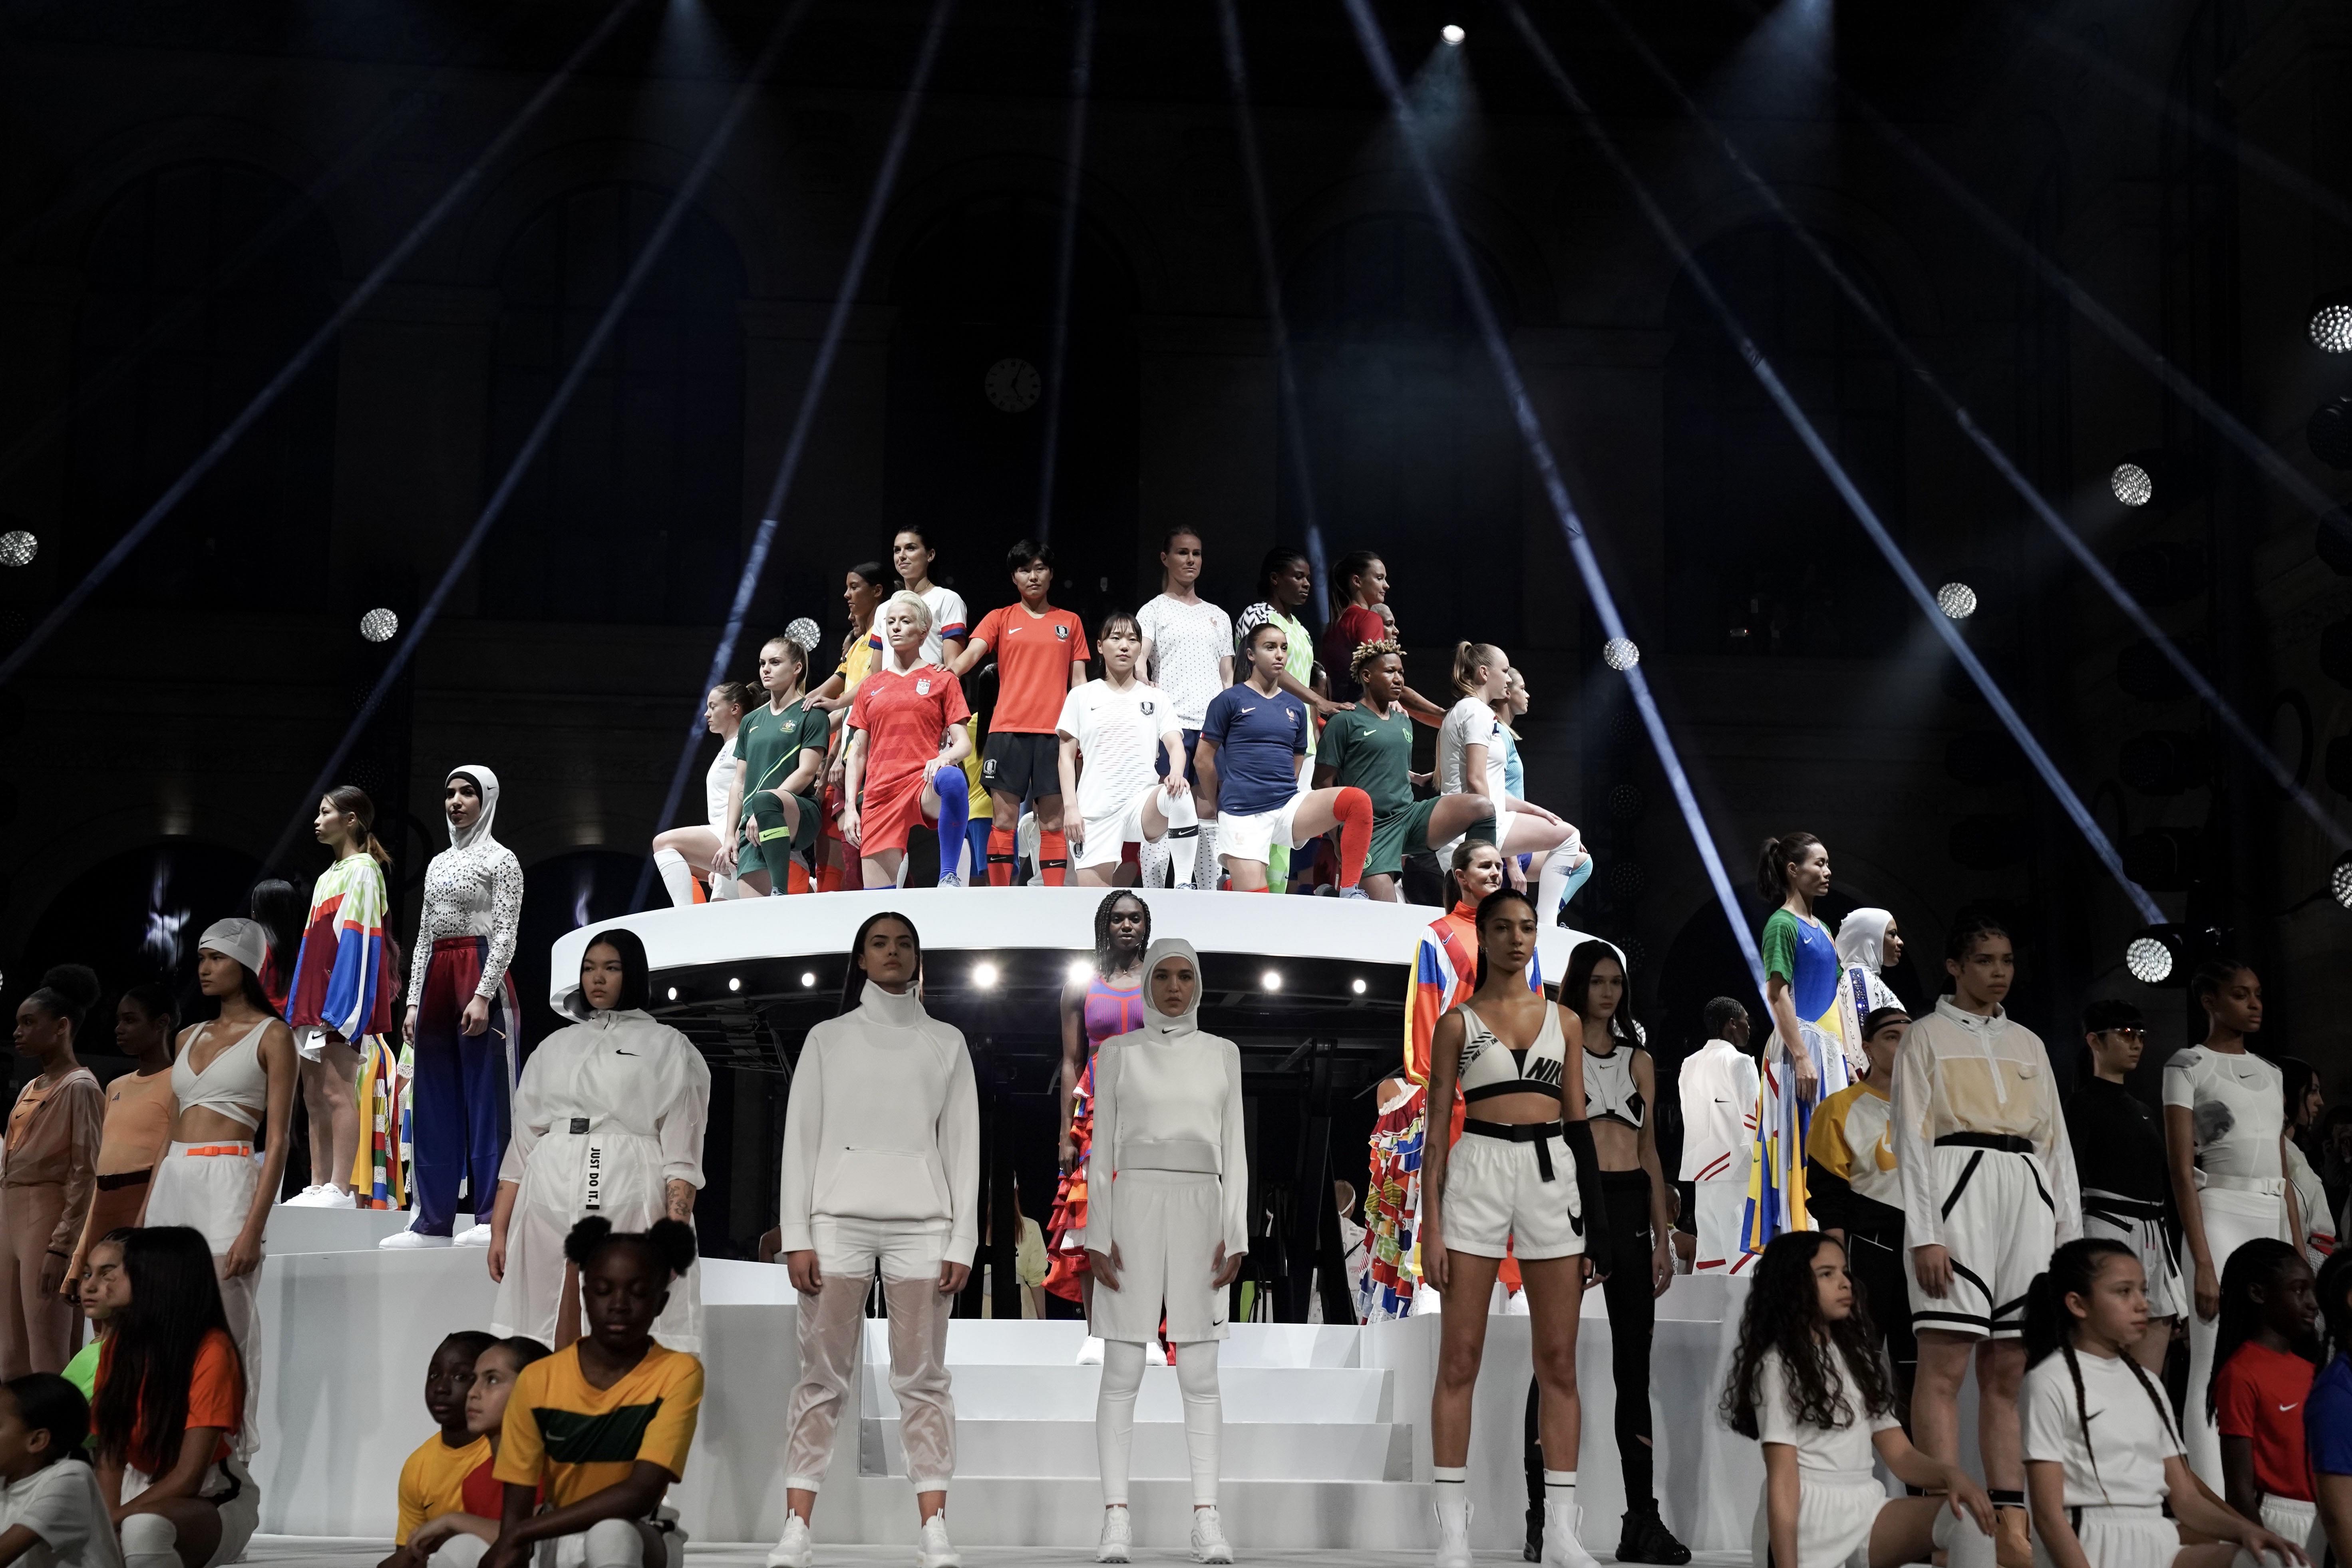 Aparecer donante Literatura  Nike unveil stunning kits for Women's World Cup in Paris | Goal.com